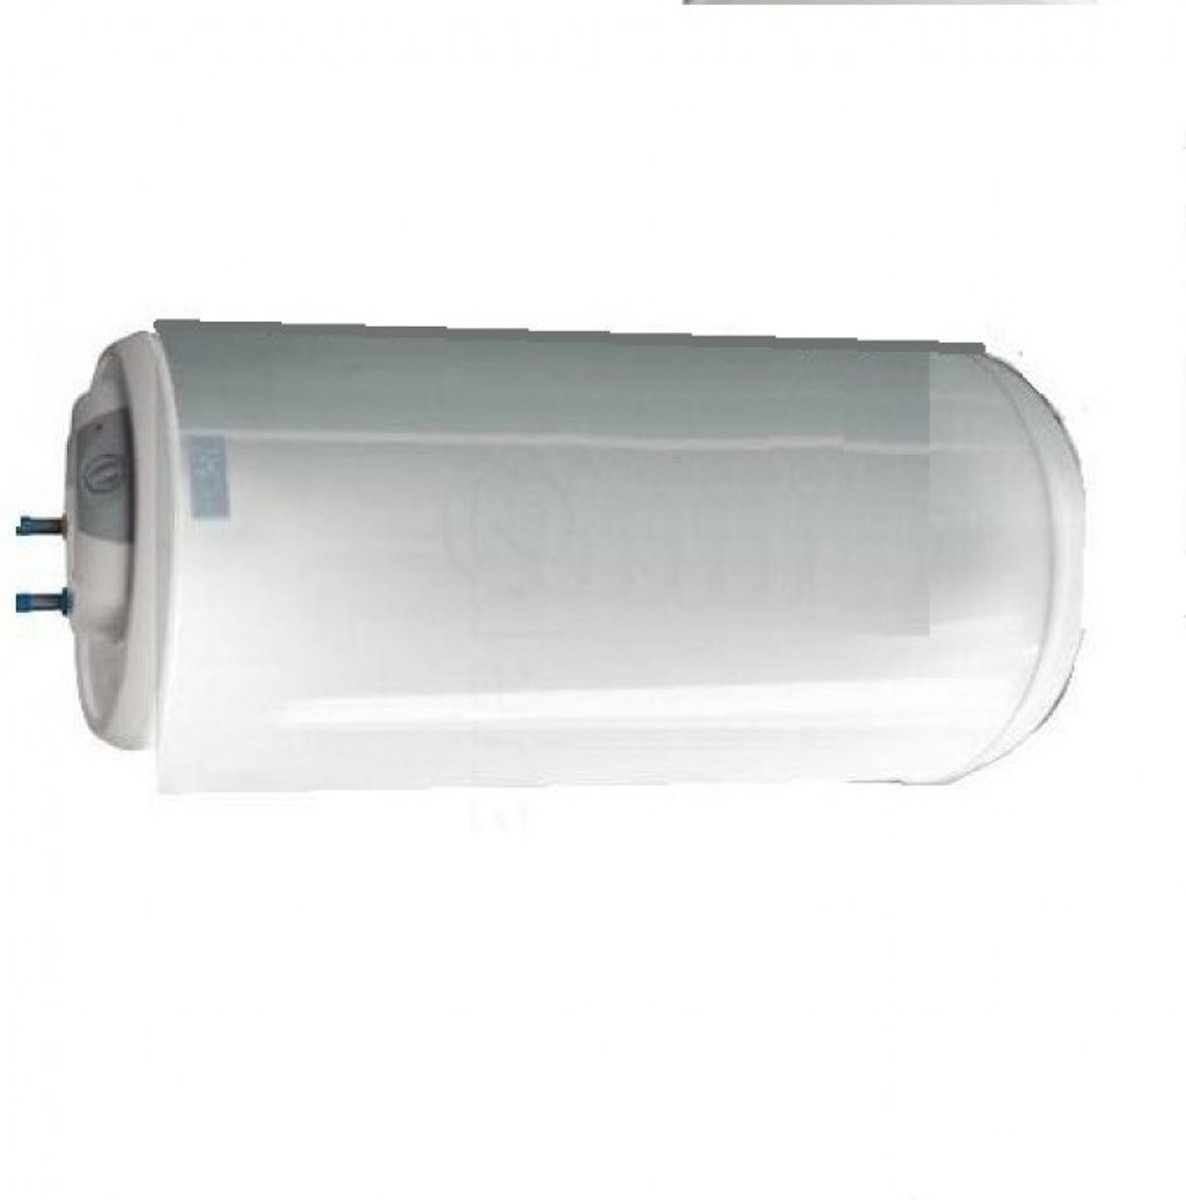 Elektrische boiler 80 liter Heizer horizontaal